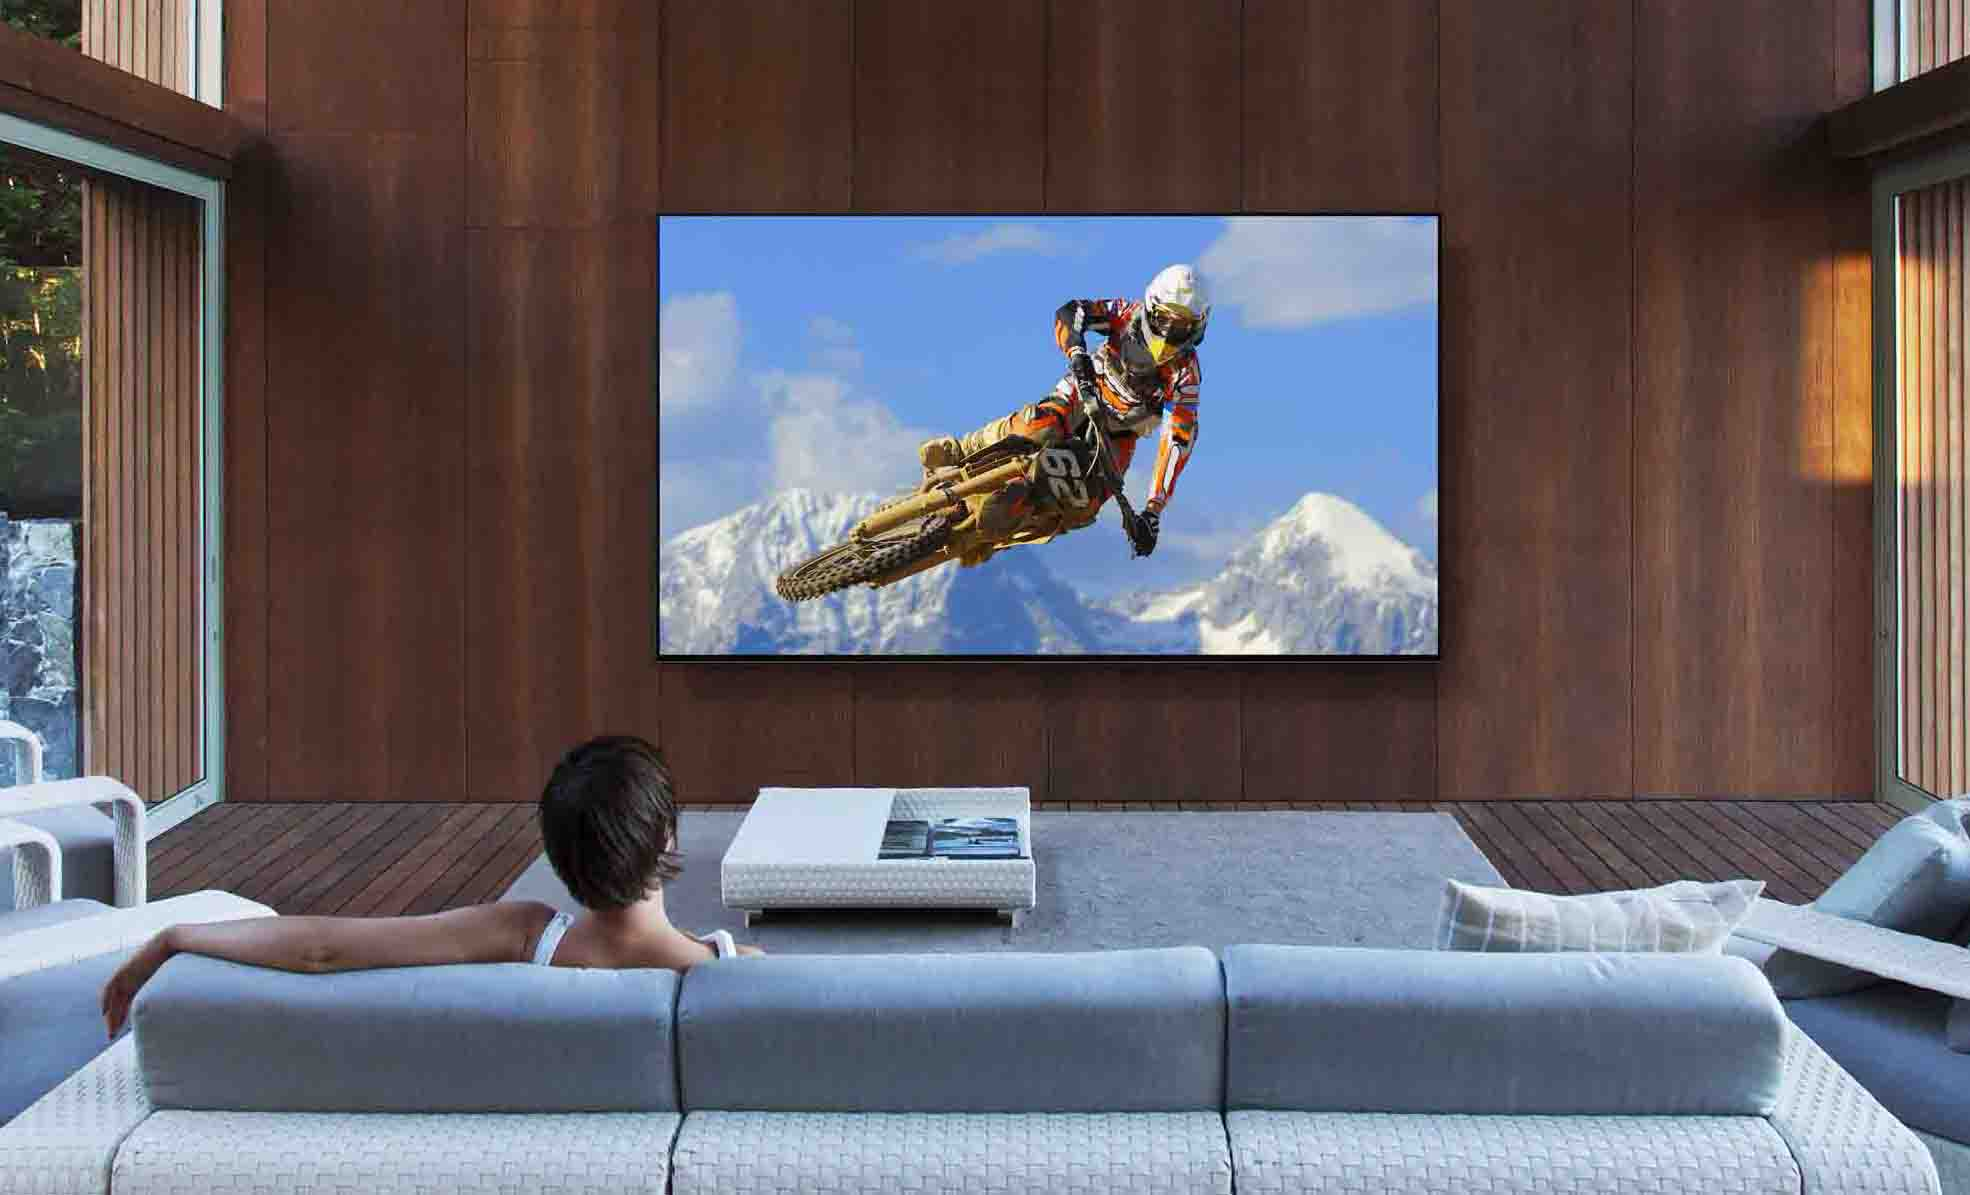 تلویزیون ۵۵ اینچ سونی مدل ۵۵x9500g